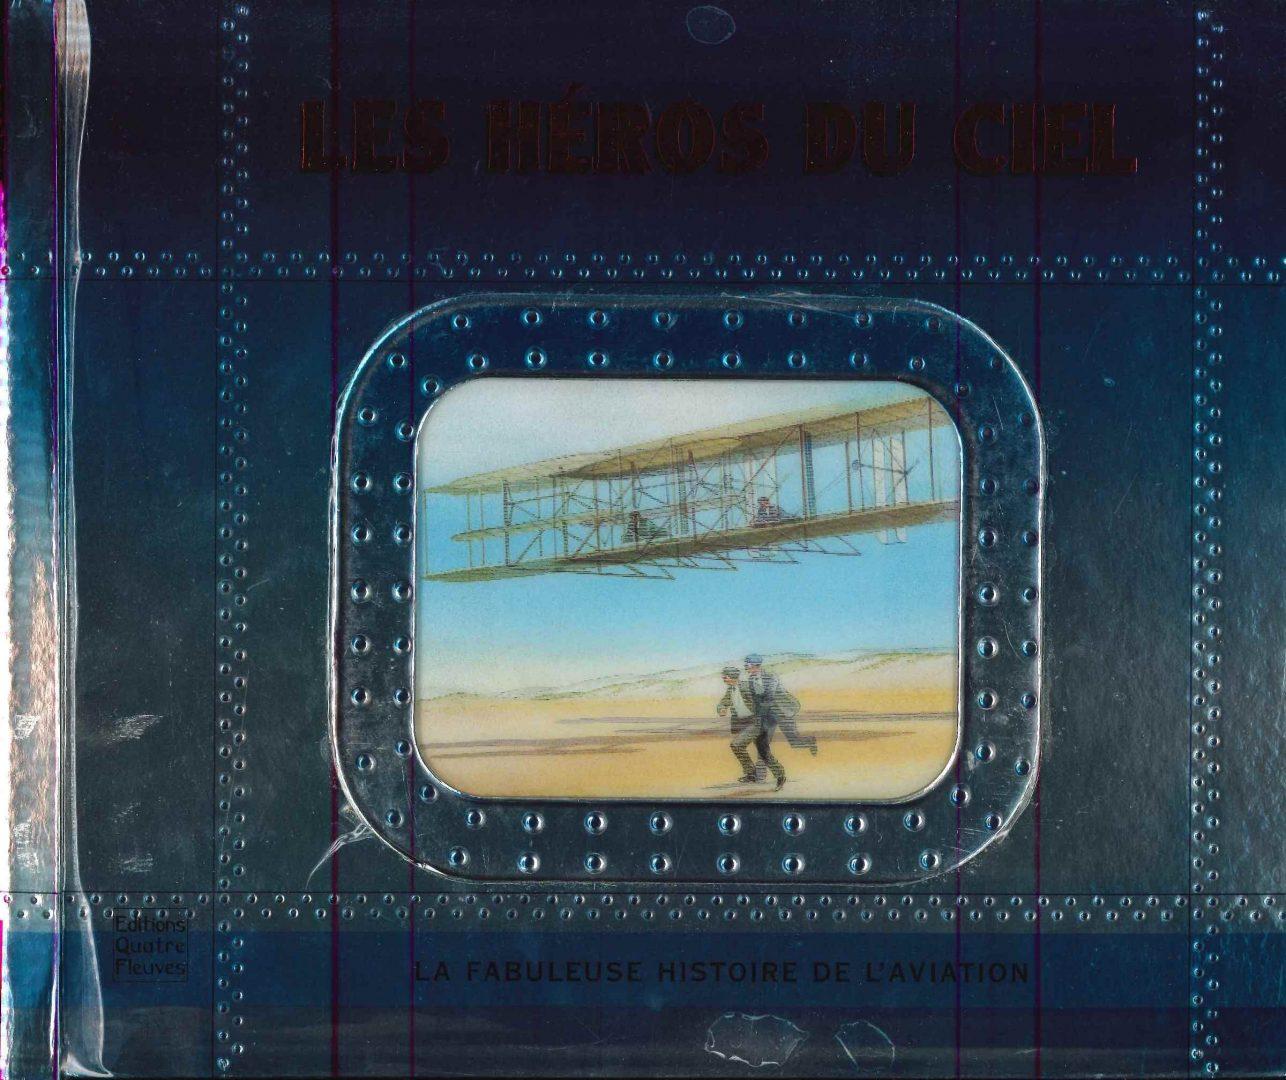 La fabuleuse histoire de l'aviation (Duncan Crosbie)